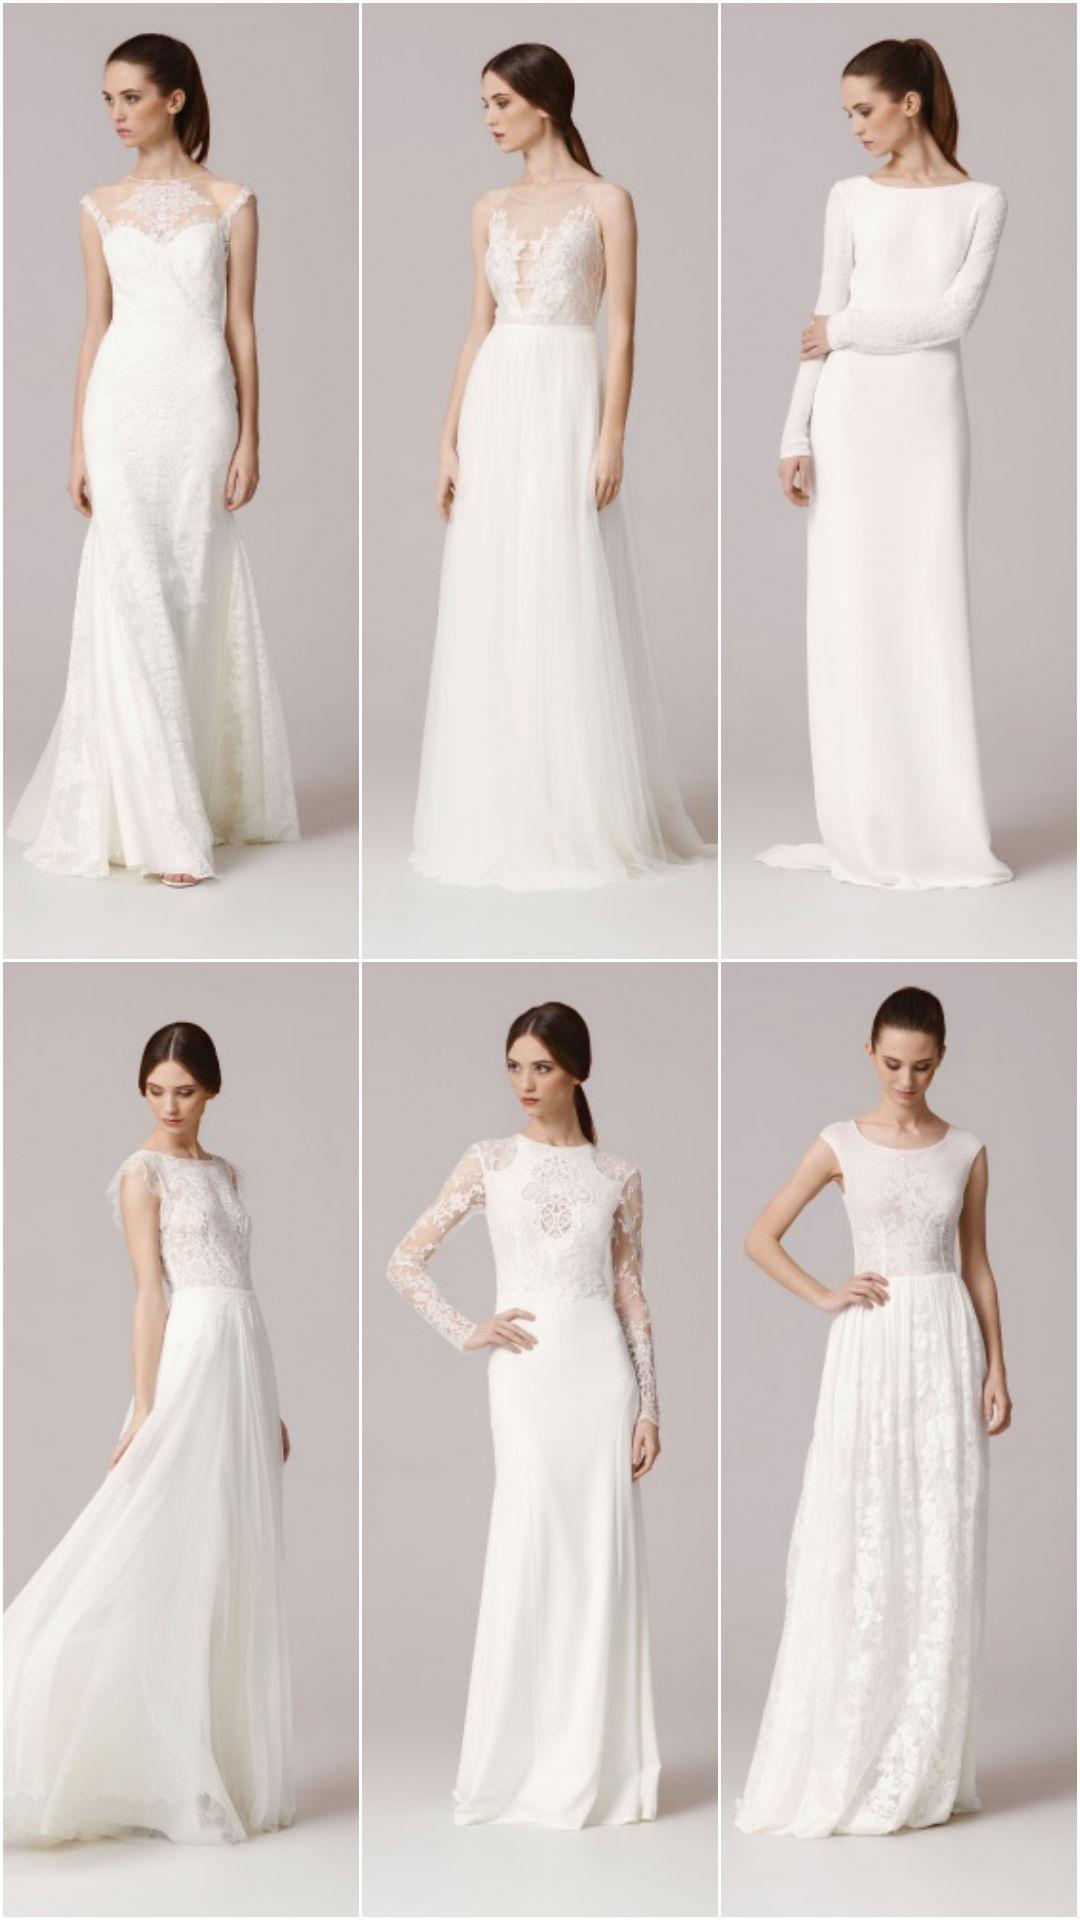 The best polish wedding dress designers 2016 wedding in for Top designers for wedding dresses